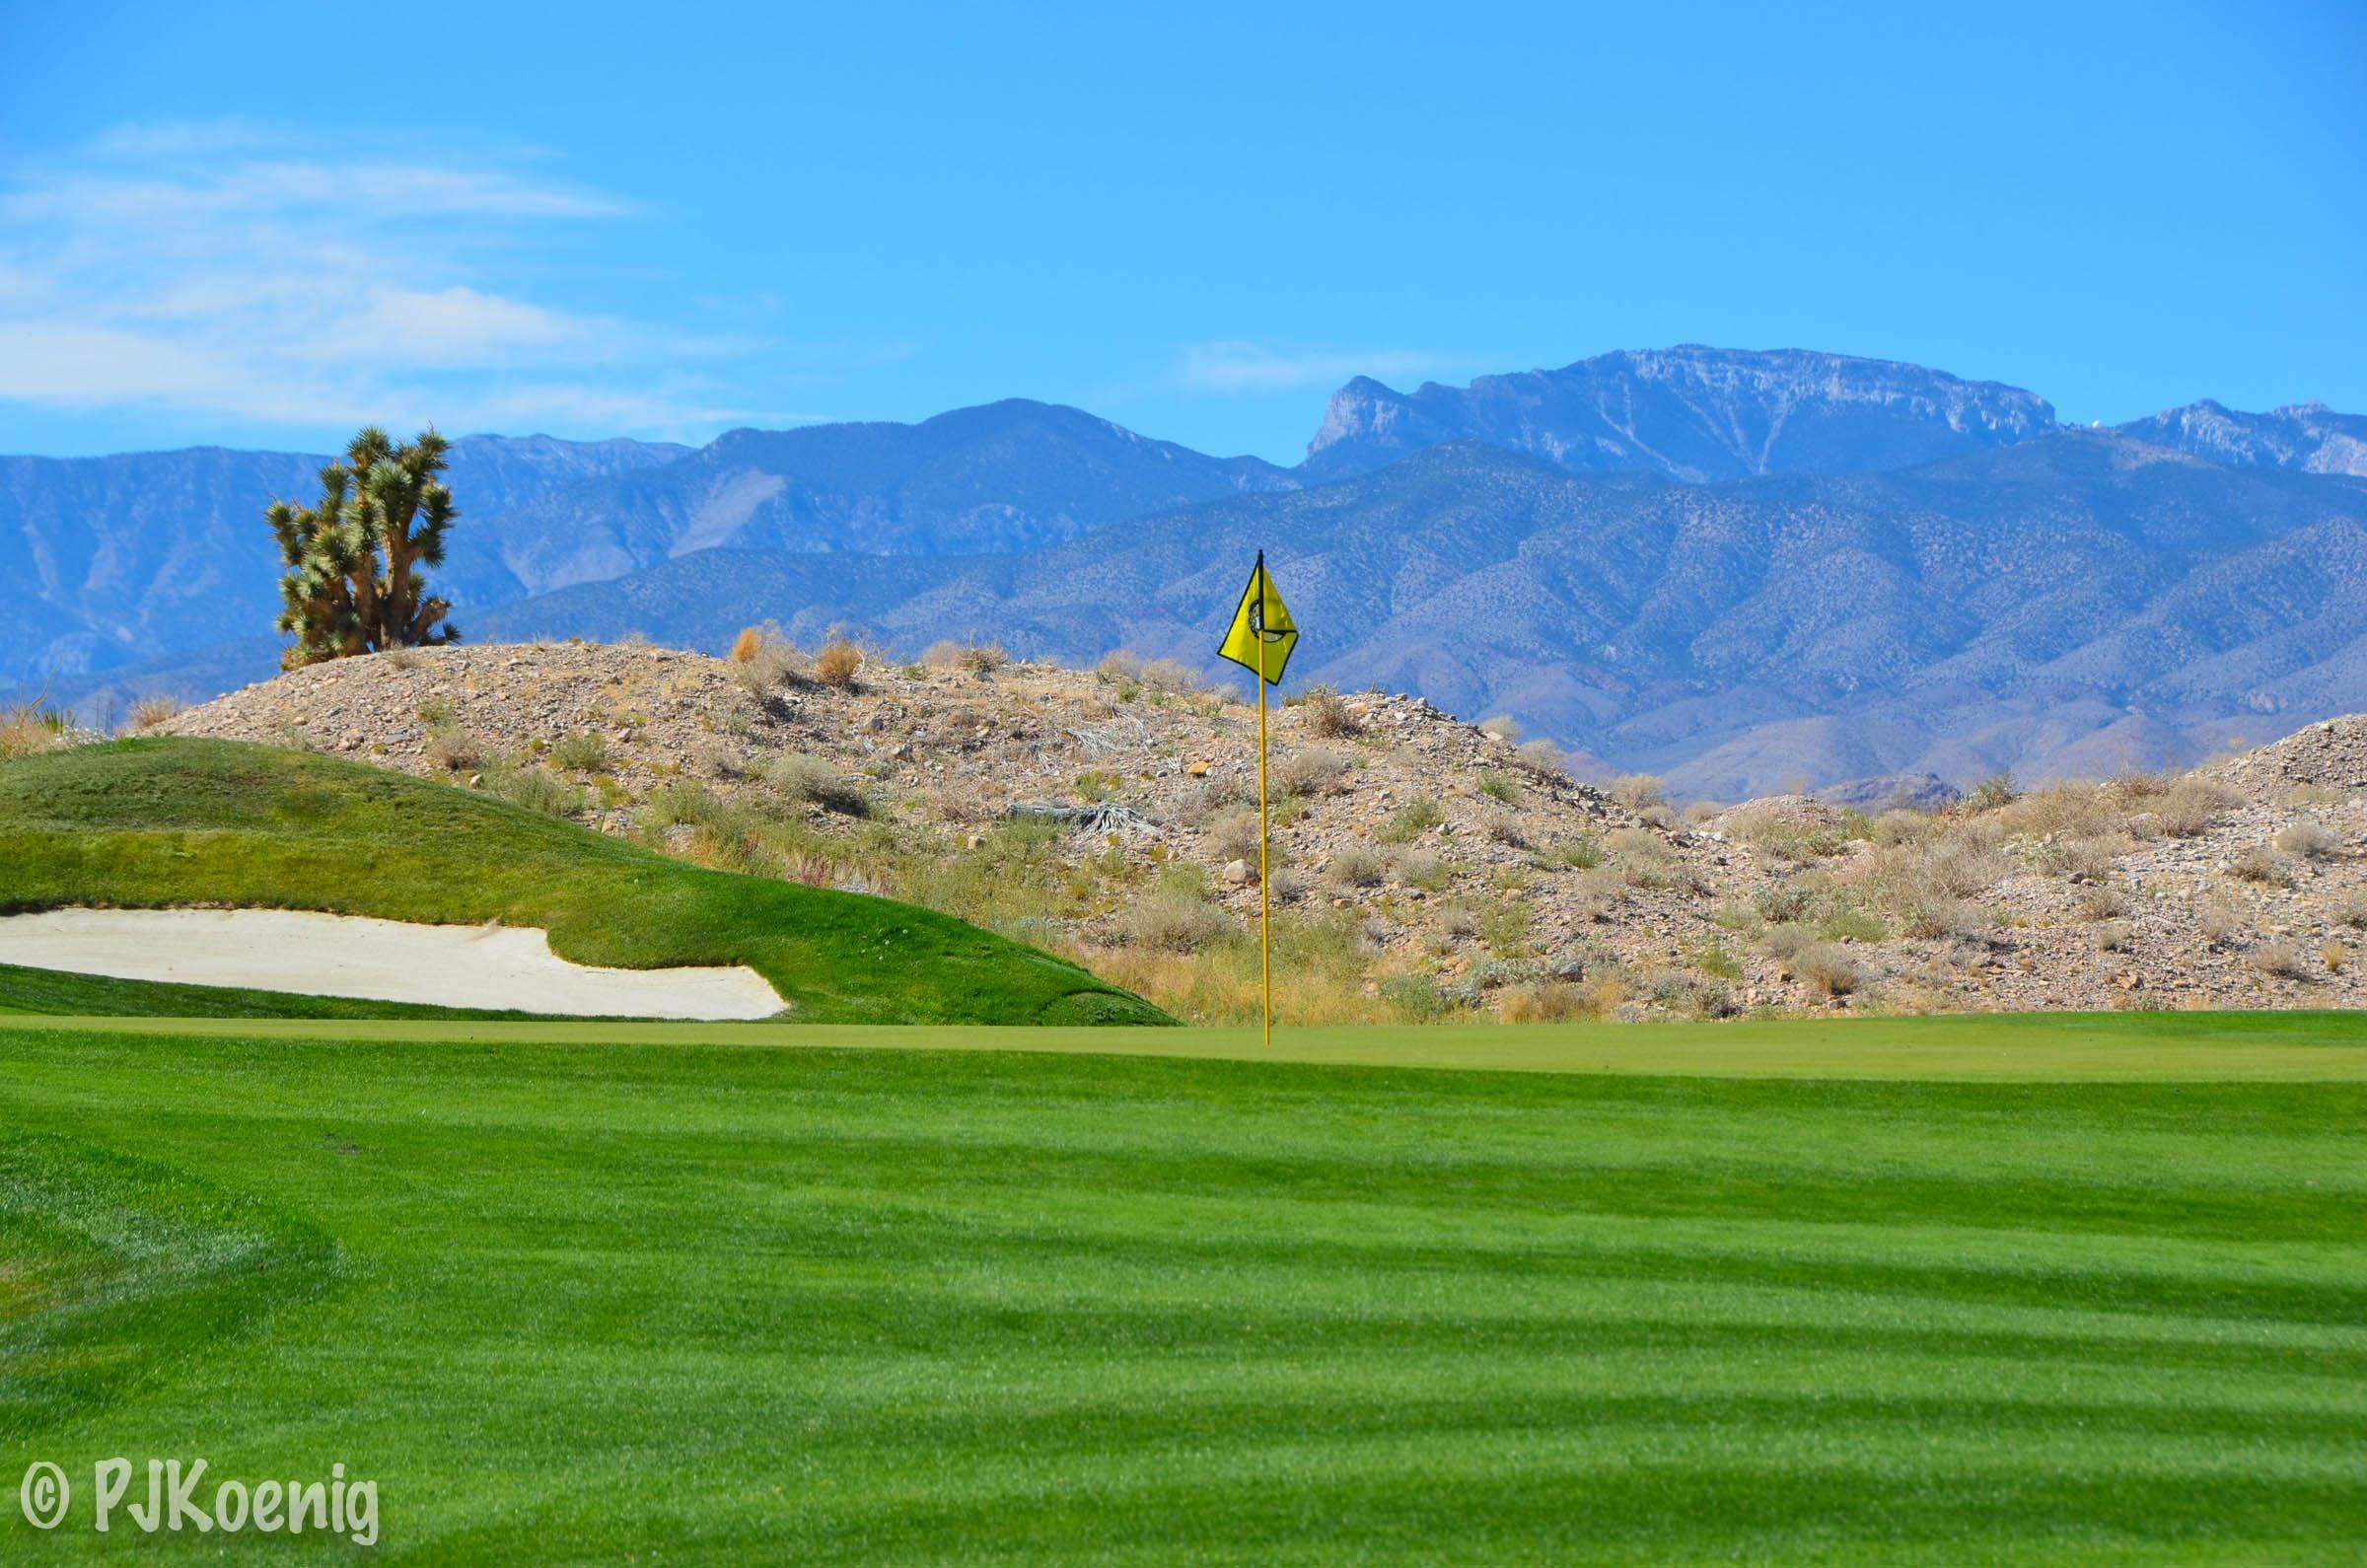 Paiute Golf Club - Las Vegas, NV